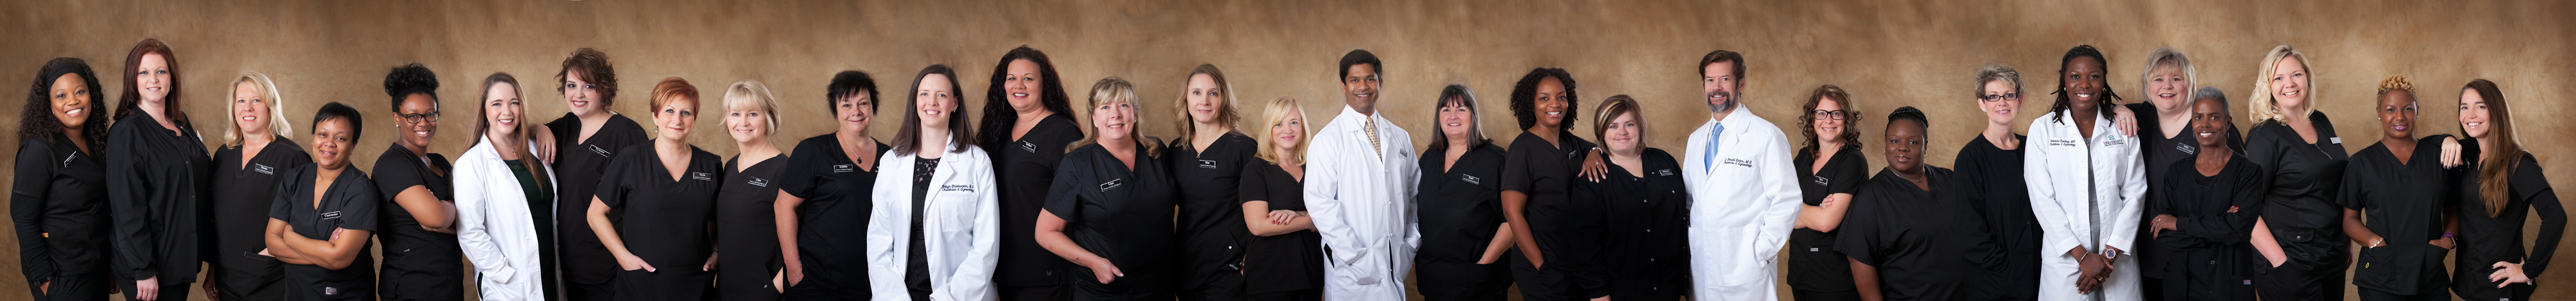 OB/GYN, Obstetrics & Gynecology services in Augusta, GA.